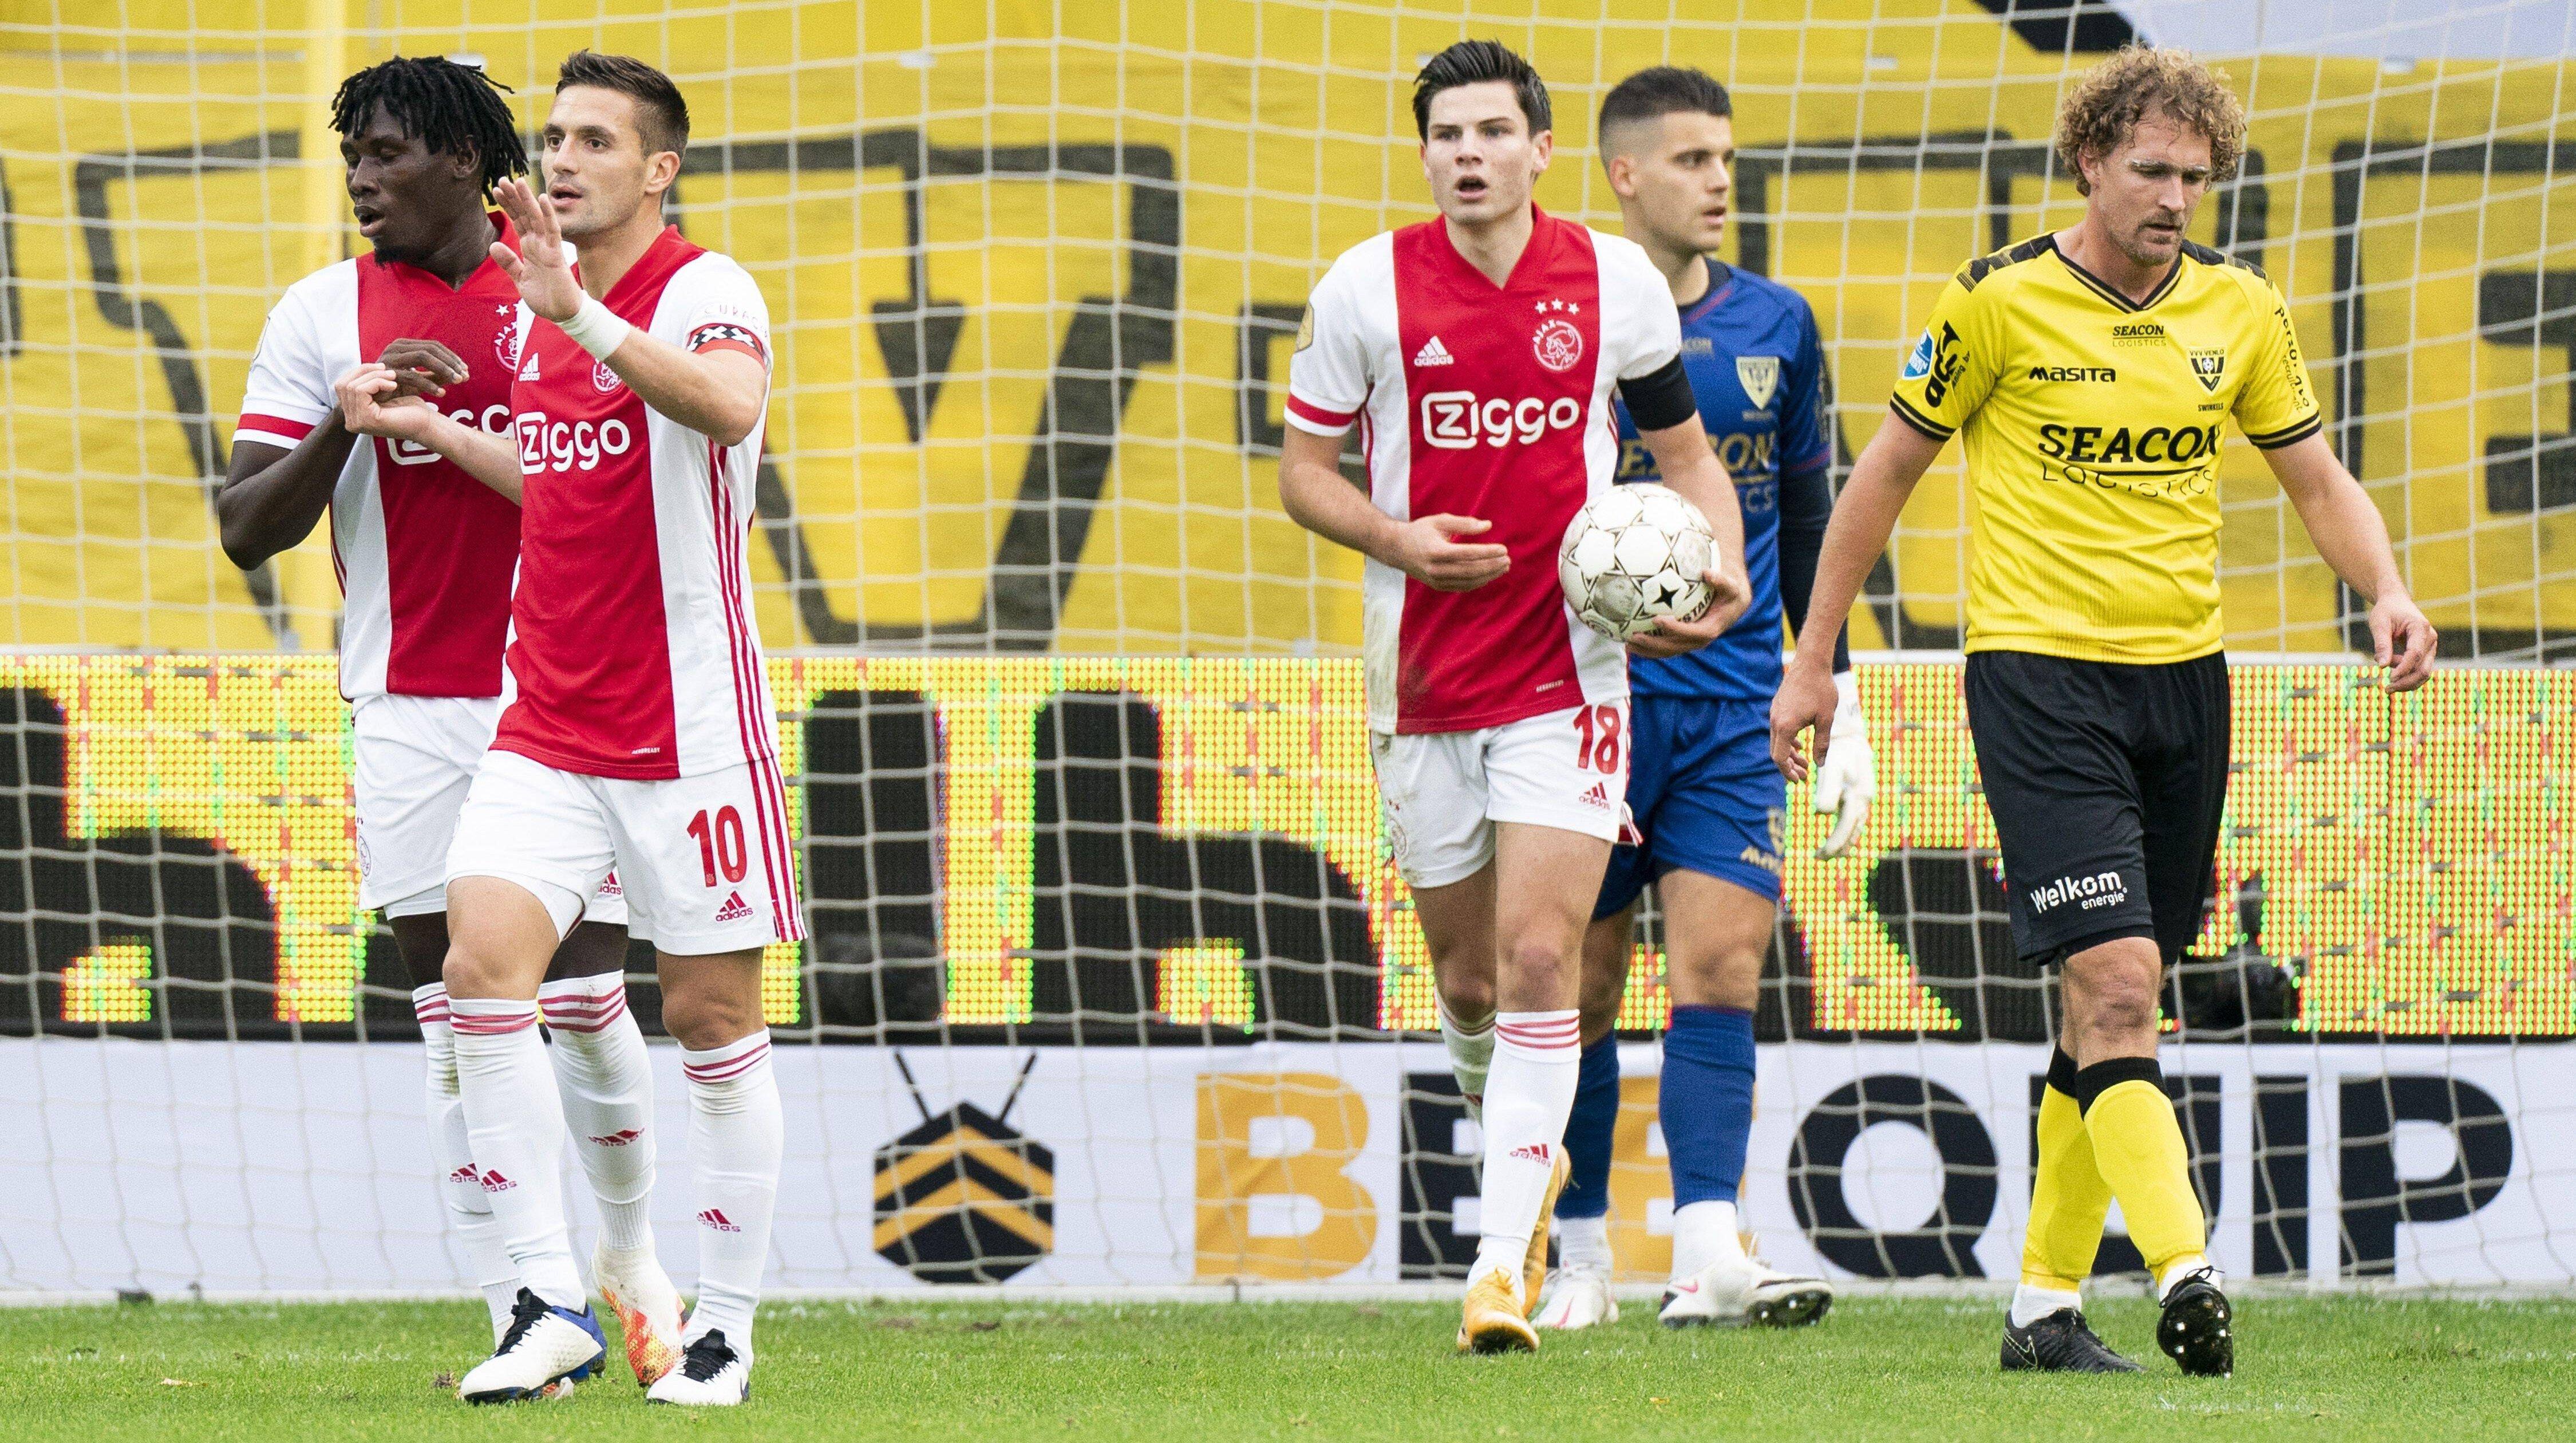 Highest Eredivisie victory in history - Ajax demolish VVV Venlo |  Transfermarkt